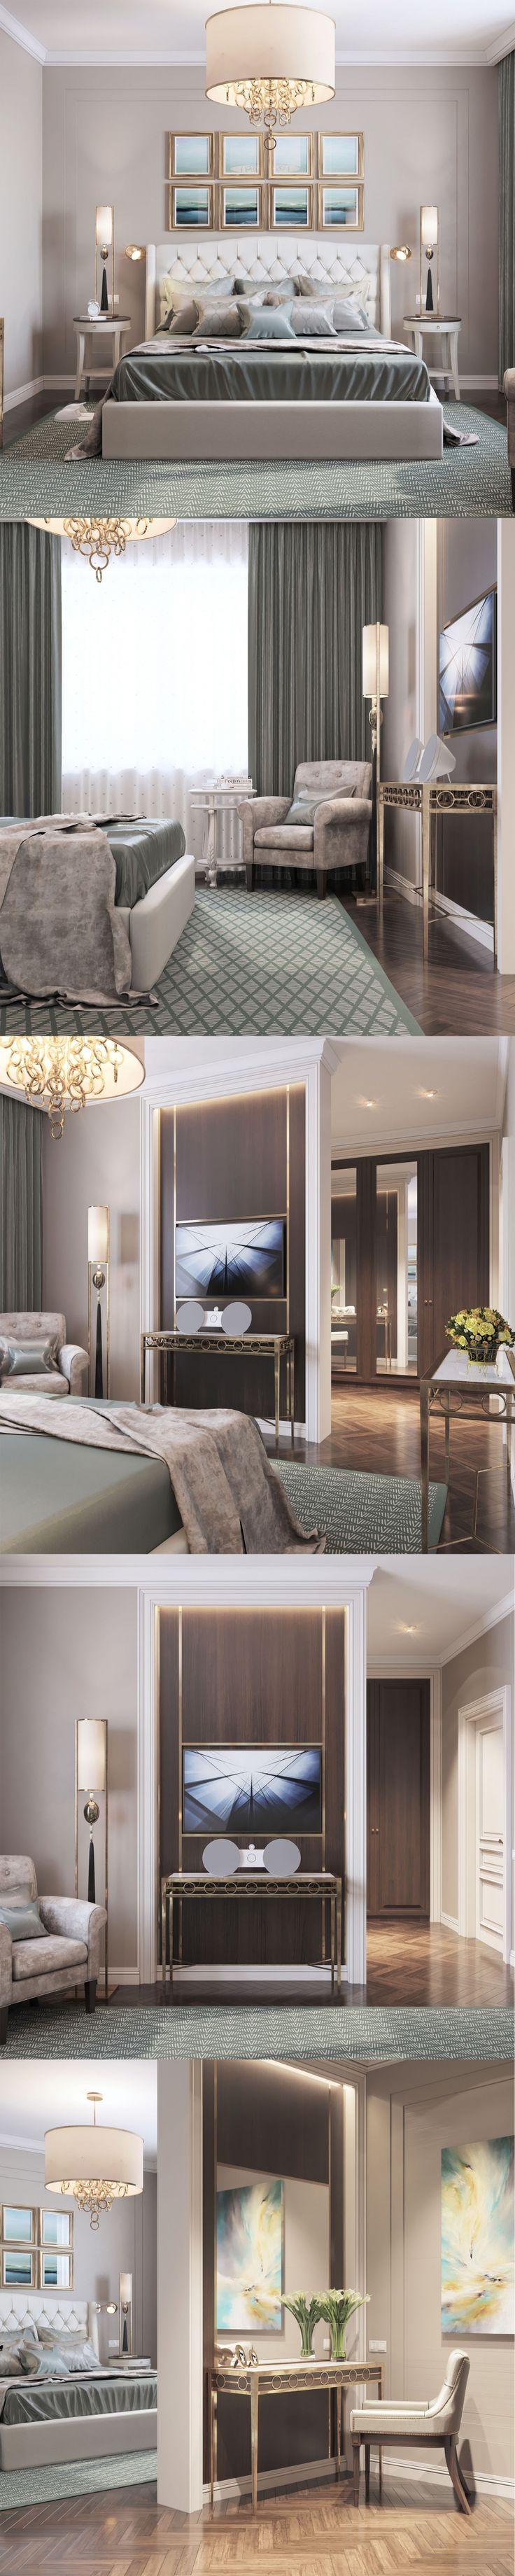 5 room hdb master bedroom design   best спальни images on Pinterest  Master bedrooms Bedroom ideas